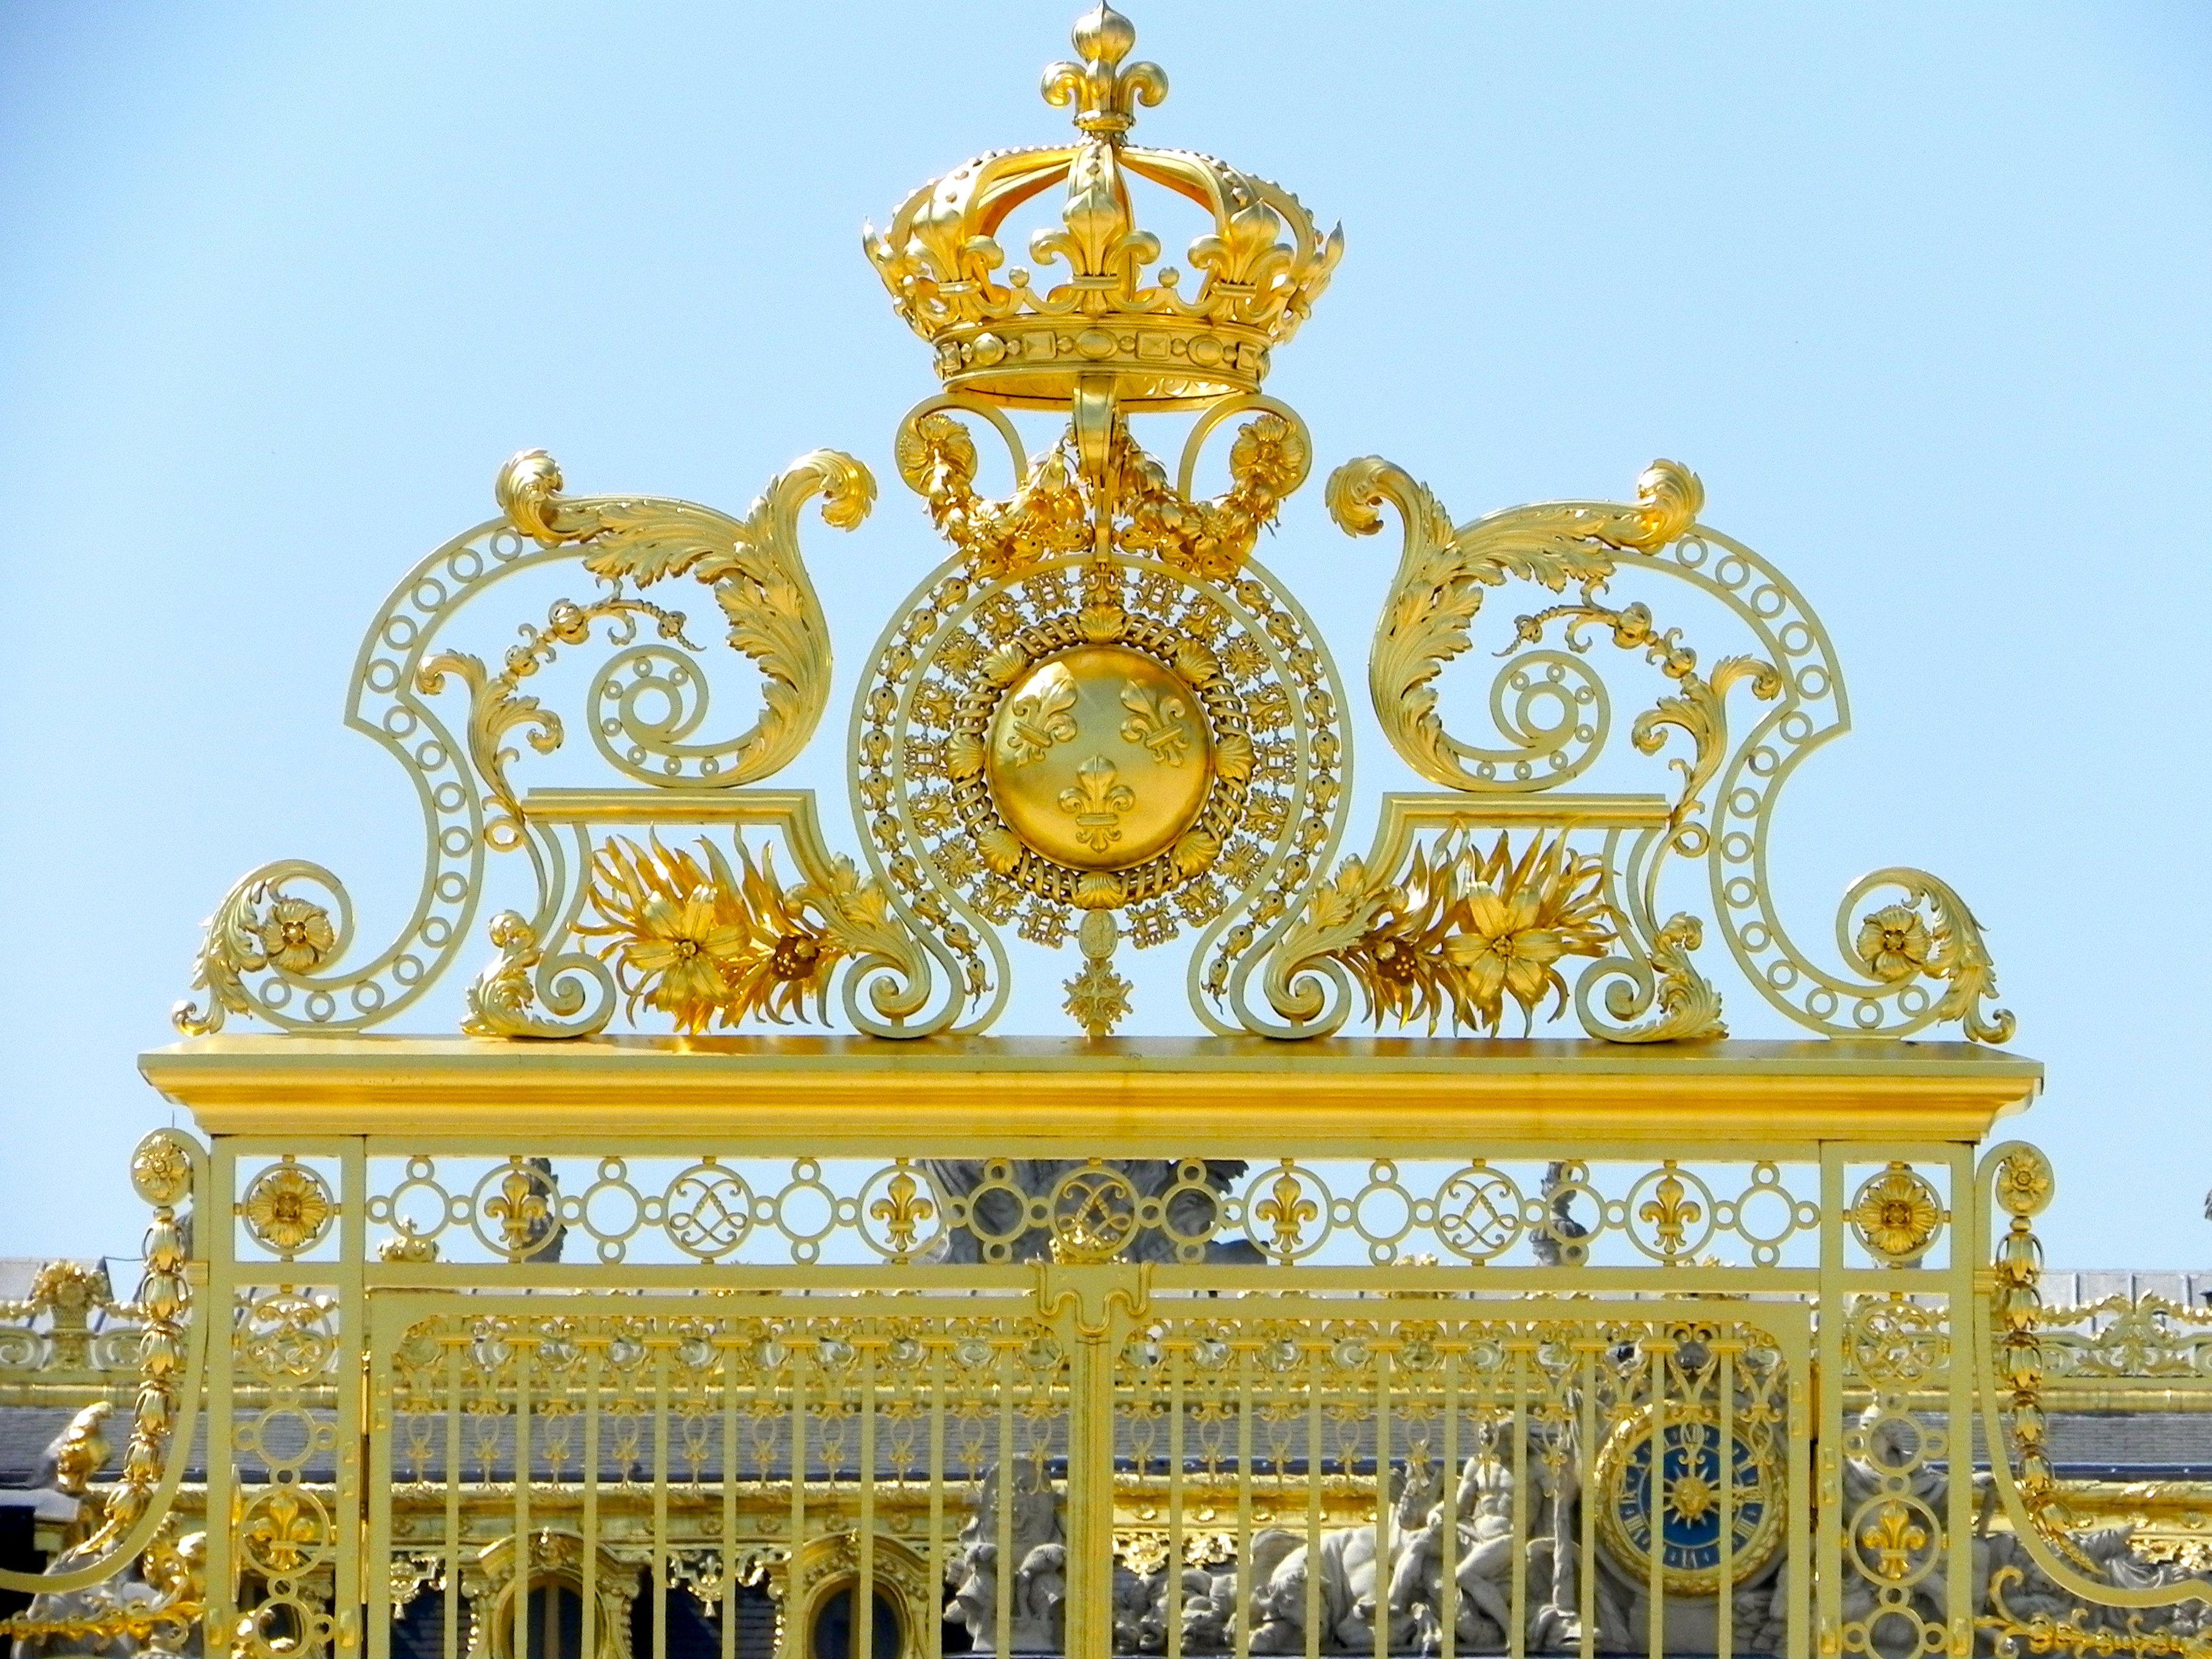 The Beautiful Gate Favorite Places Driveway Gate